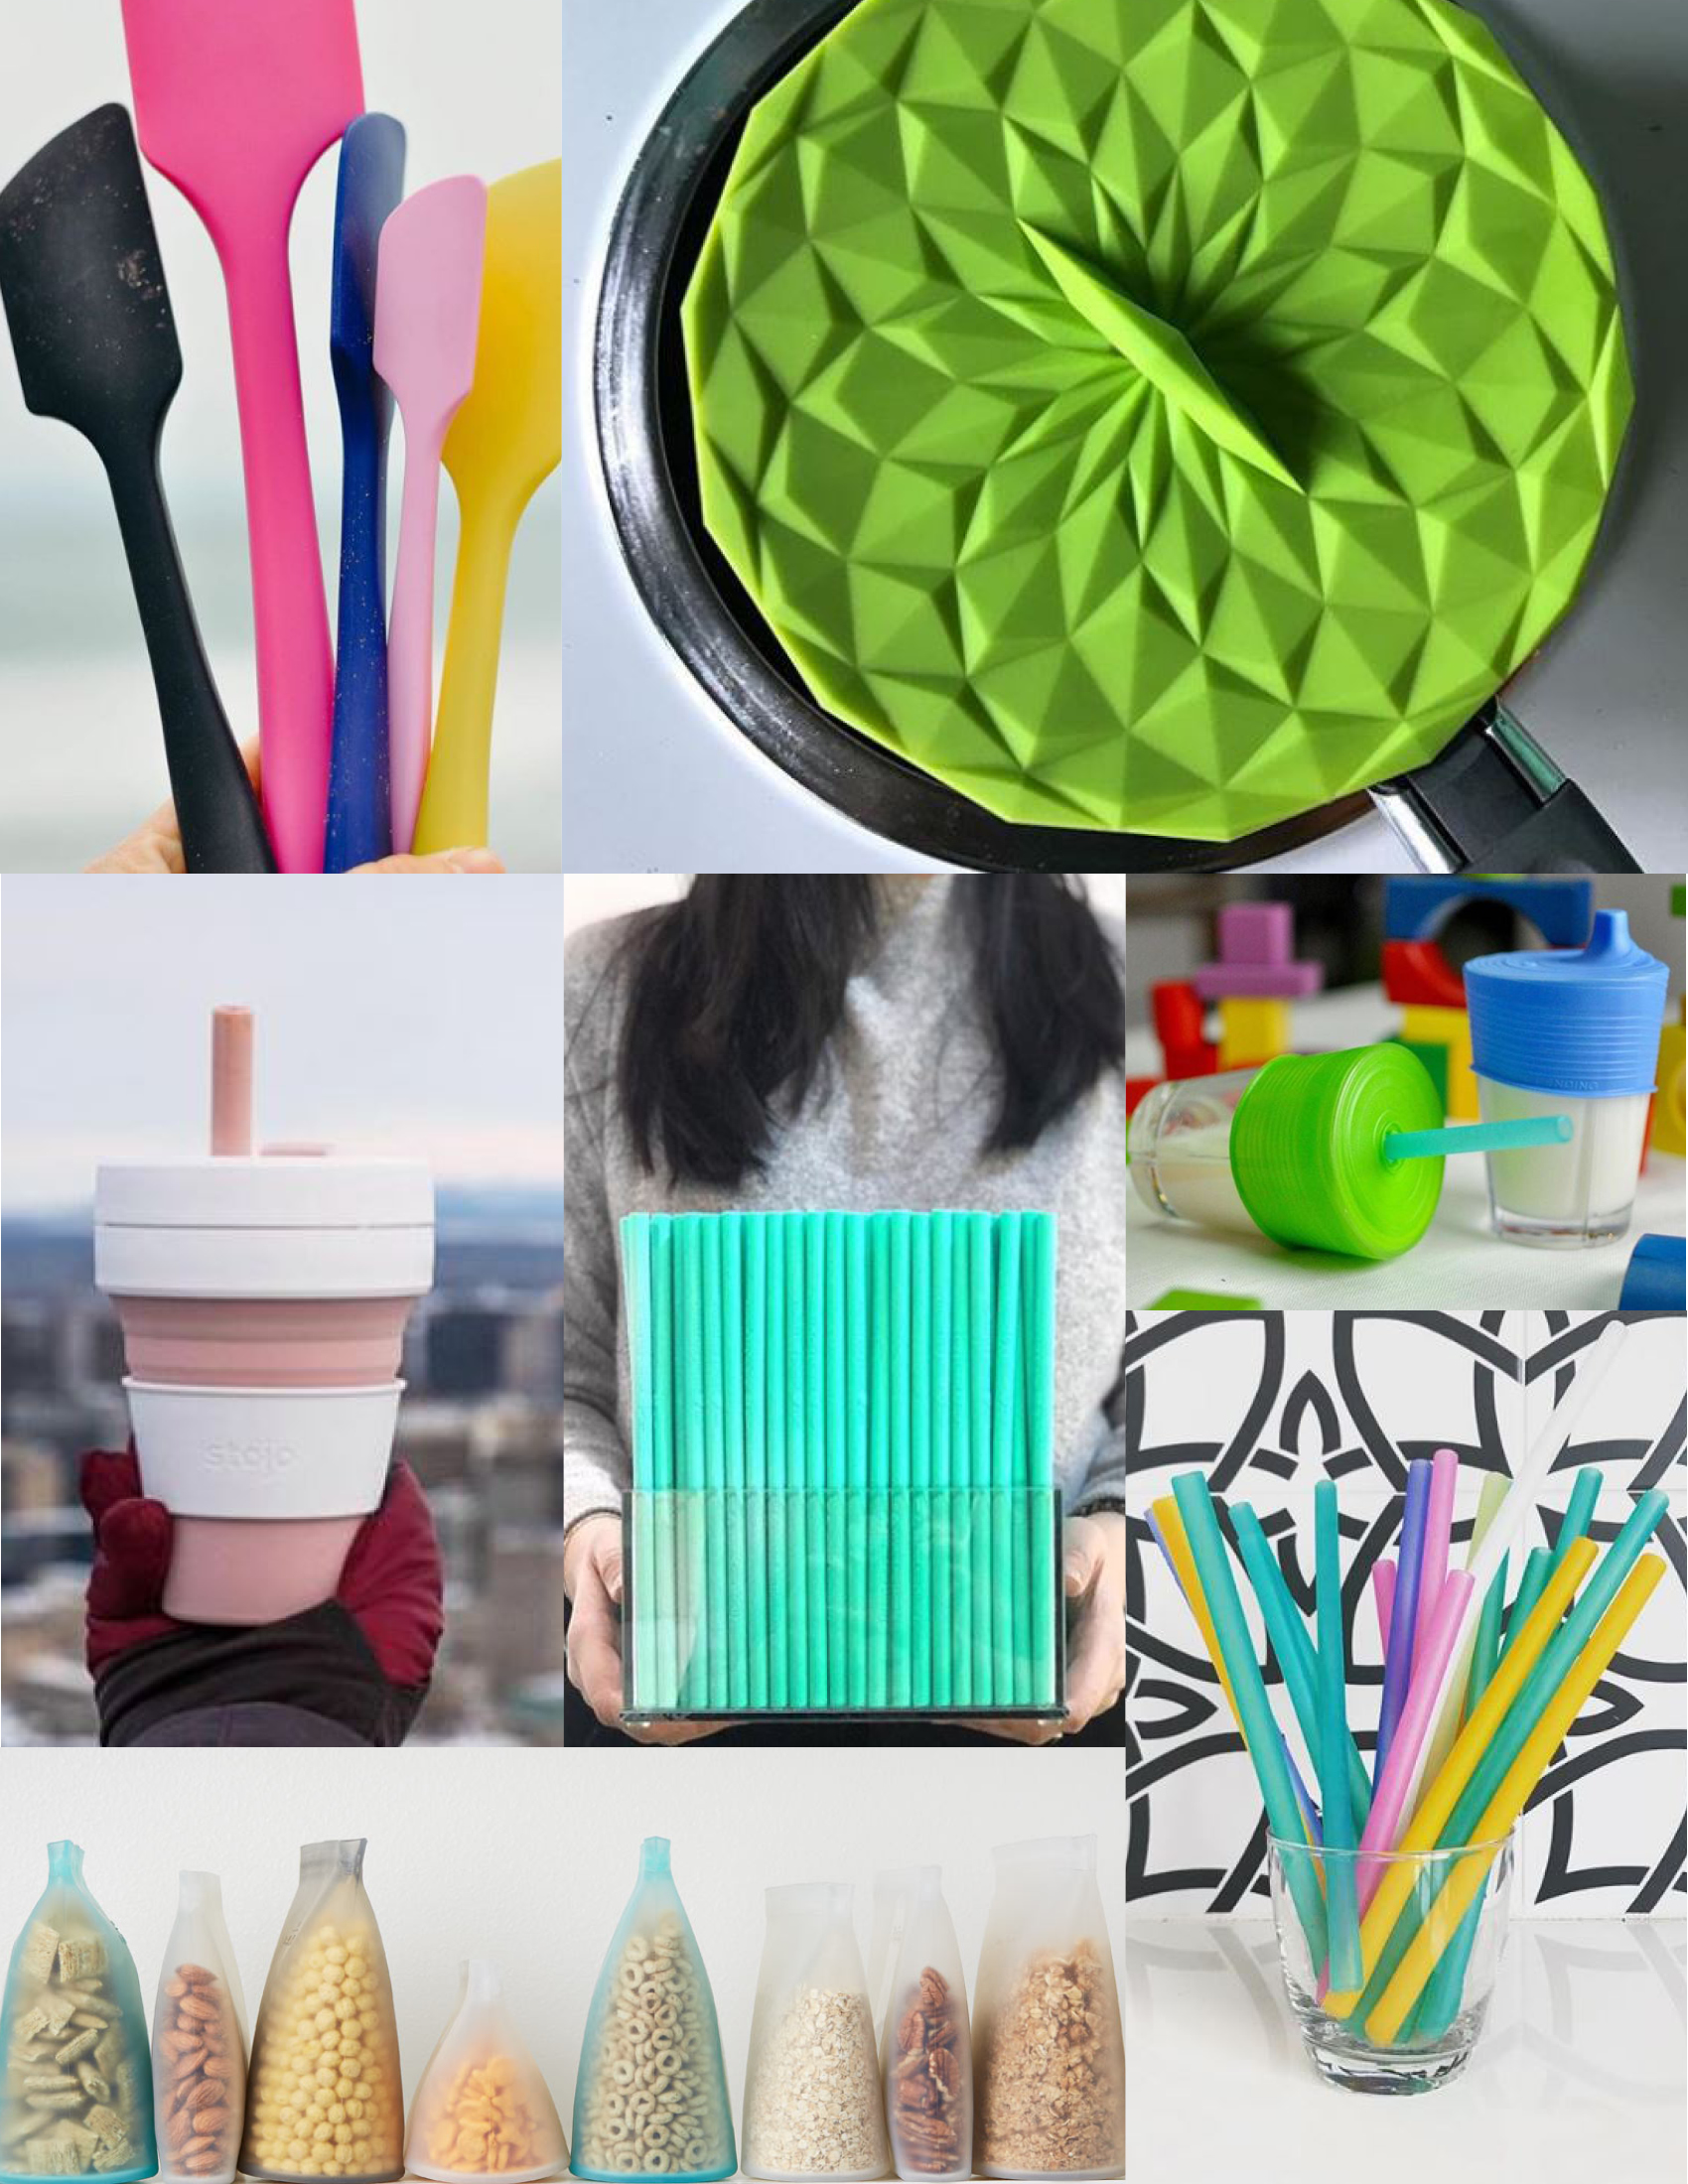 HousewaresShow_2019_Trends_B2.jpg